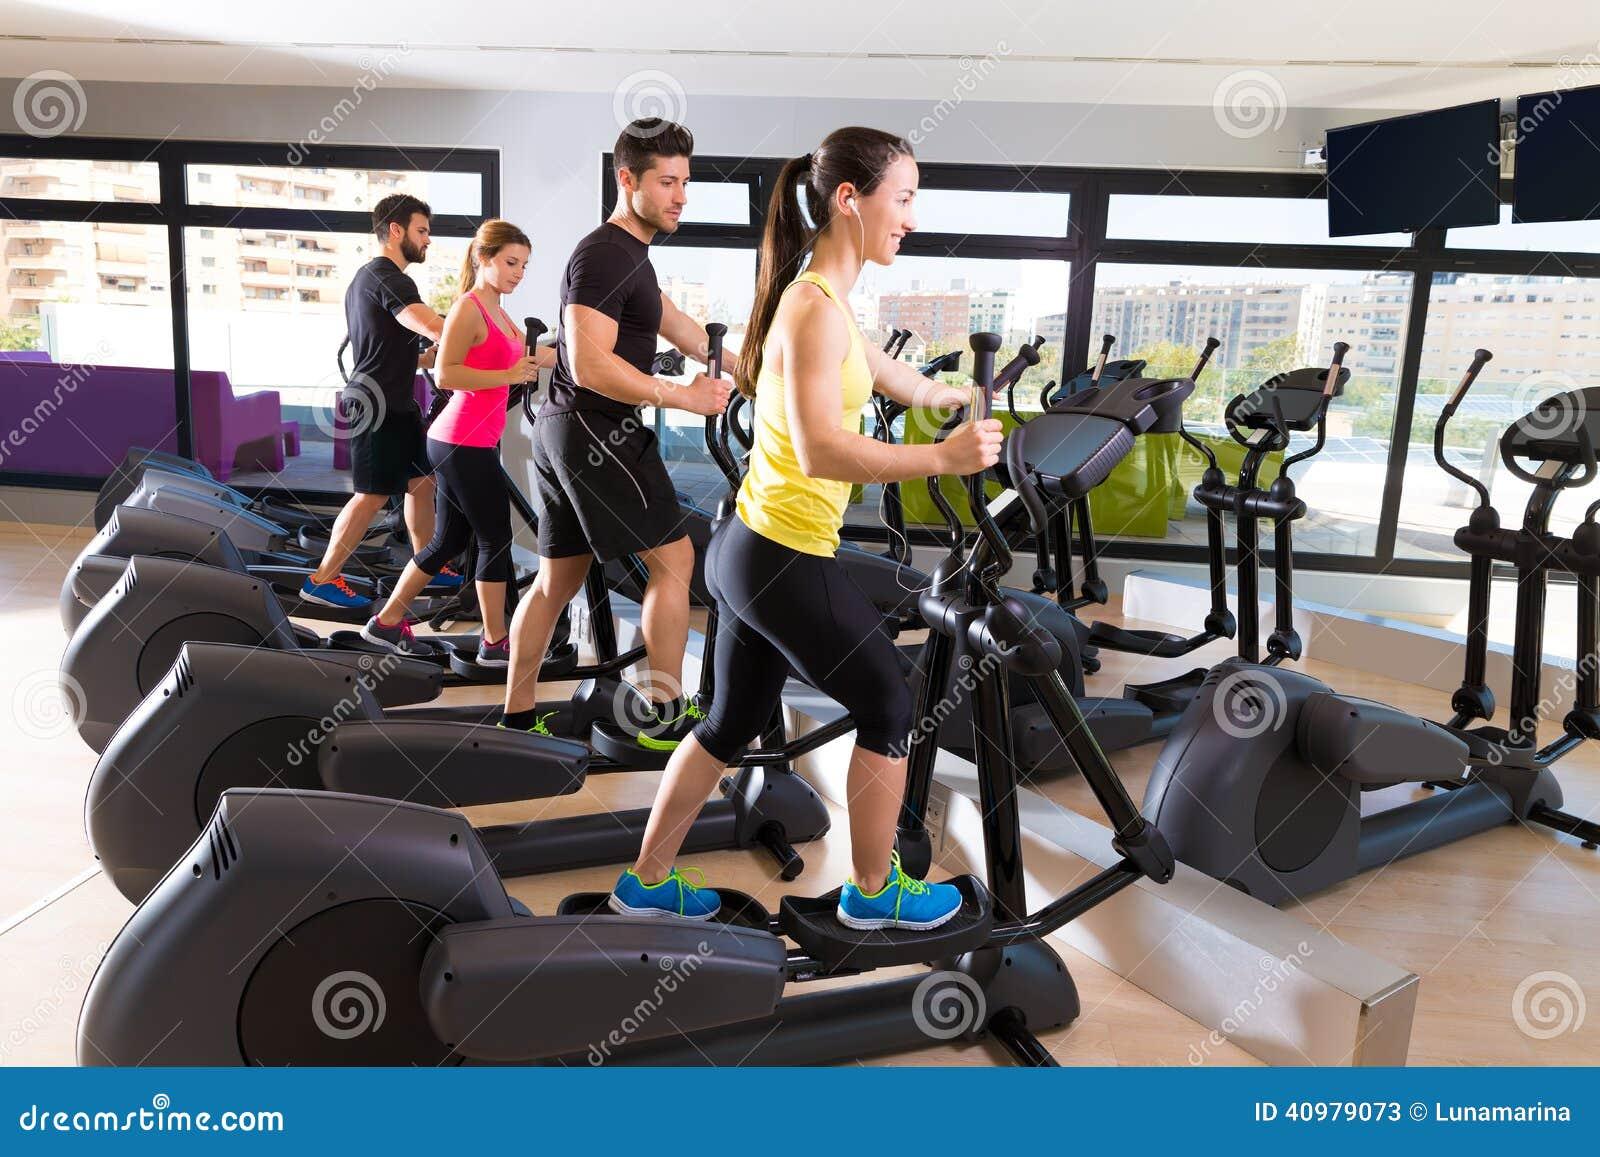 Aerobics elliptical walker trainer group at gym stock for Gimnasio fitness las rosas